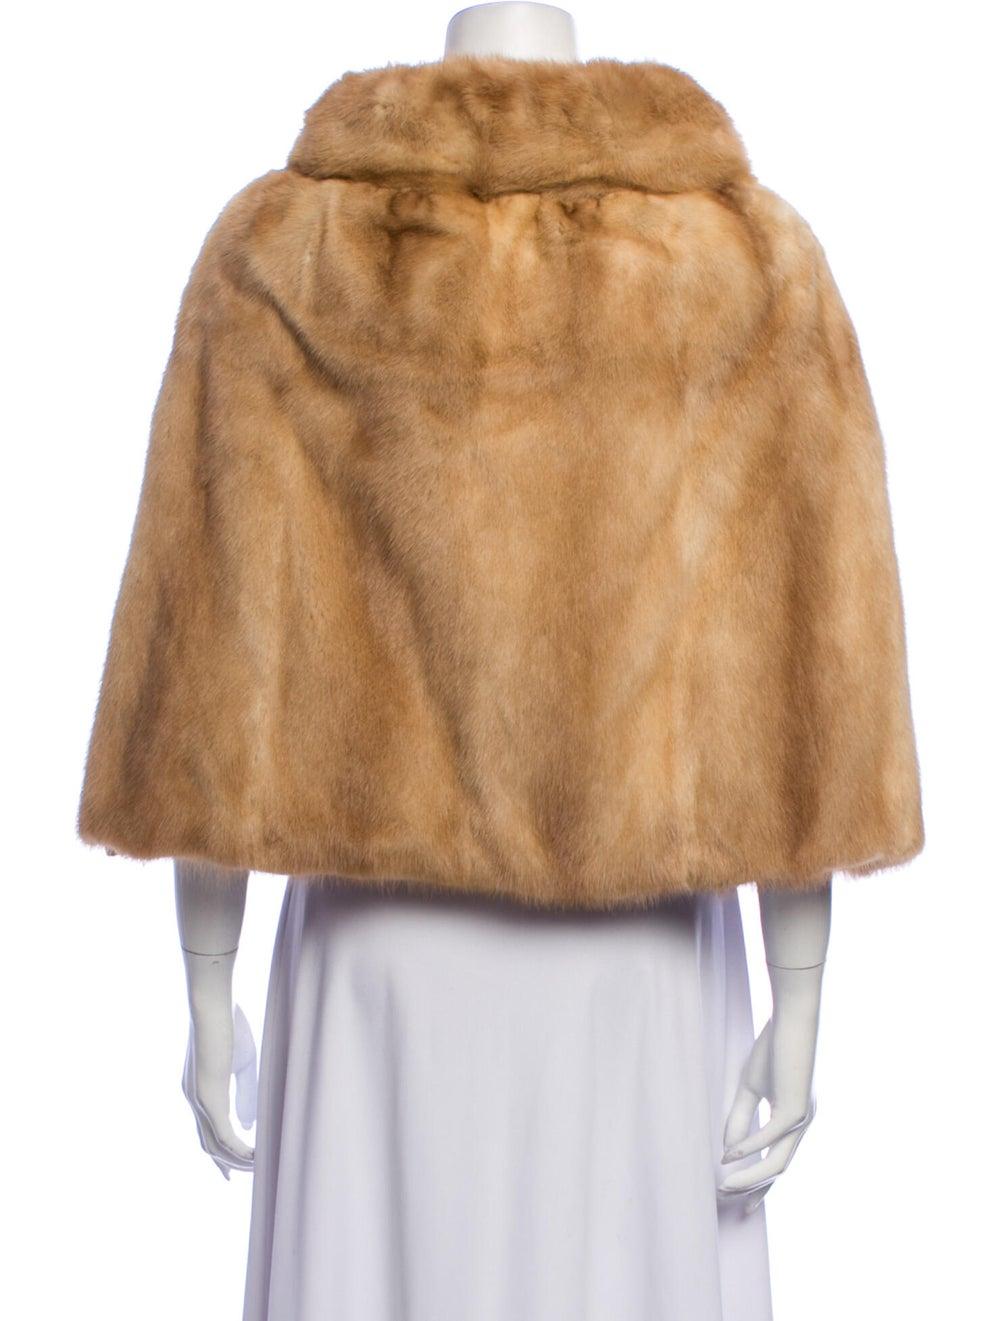 Fur Cape - image 3